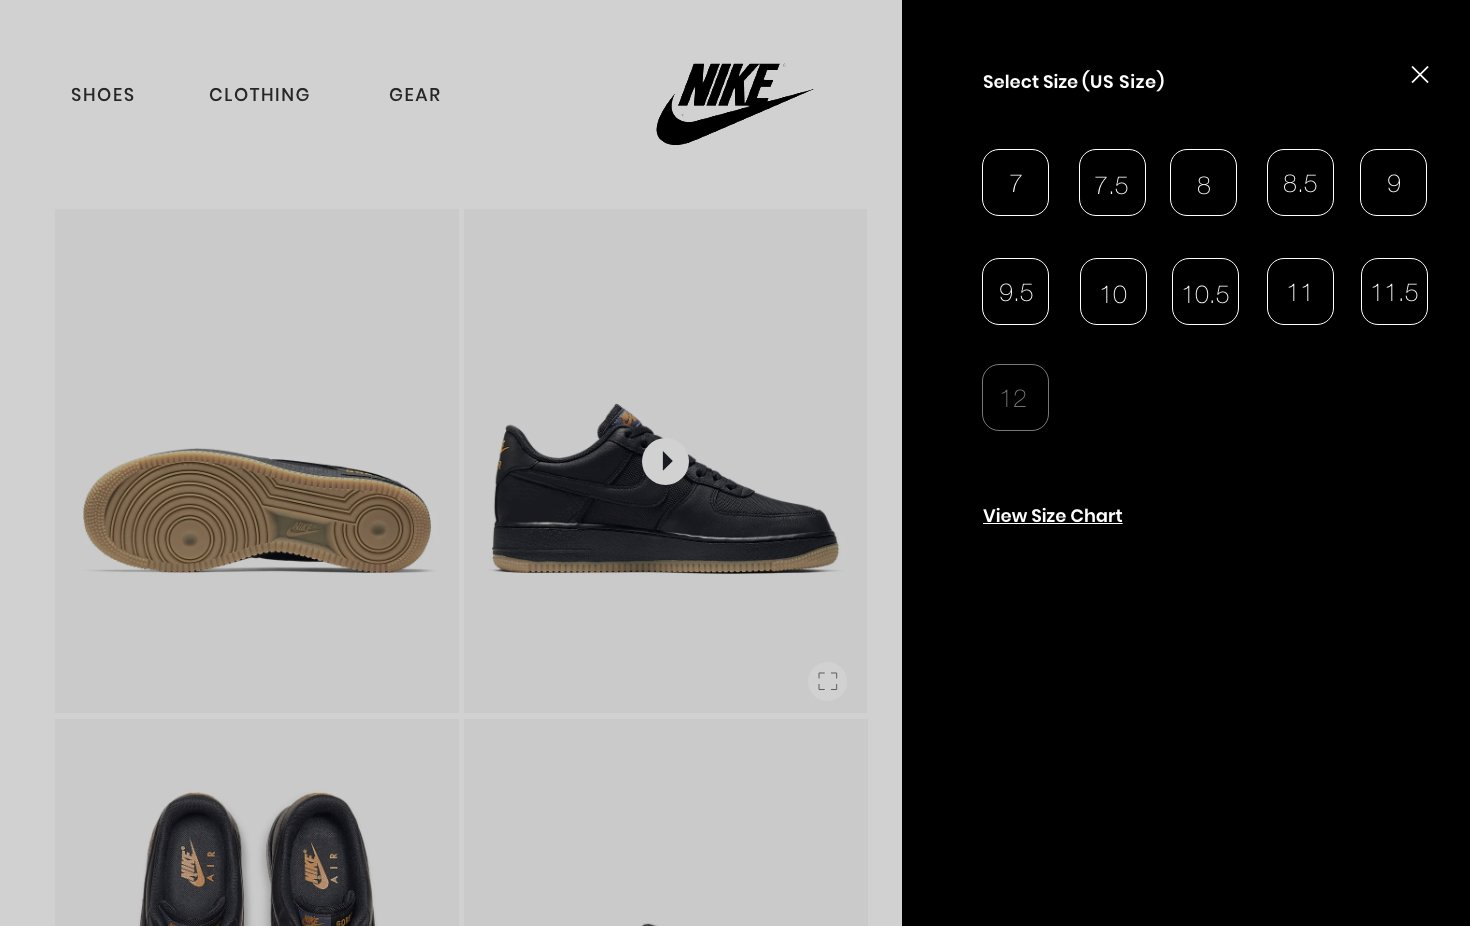 Bueno Kilómetros Registrarse  Nike Web design Challenge - UpLabs